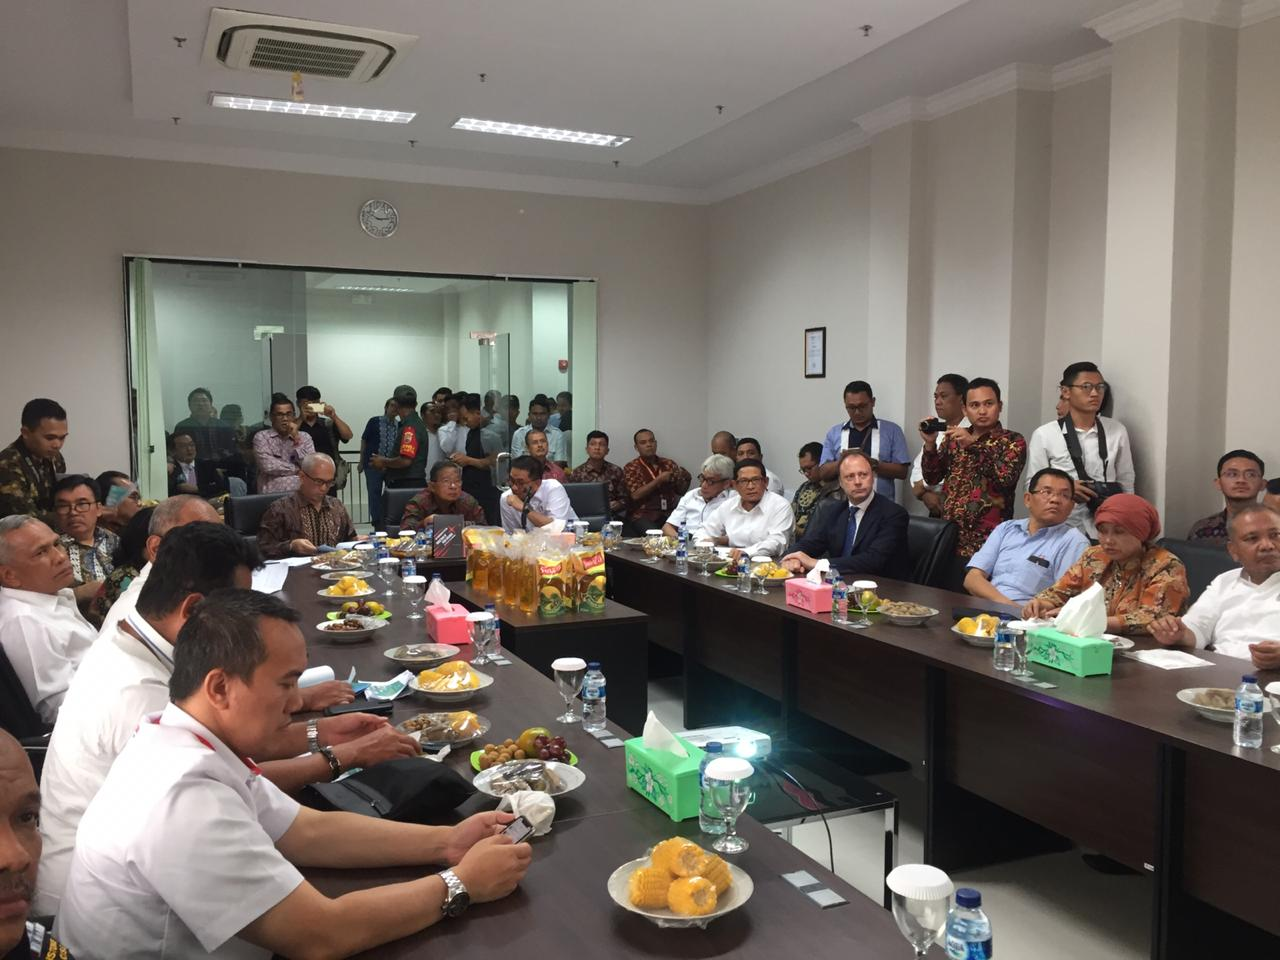 Menko Ekonomi Darmin Nasution Kunjungi KEK Sei Mangkei, Infrastruktur dan Industri di Sumatera Utara